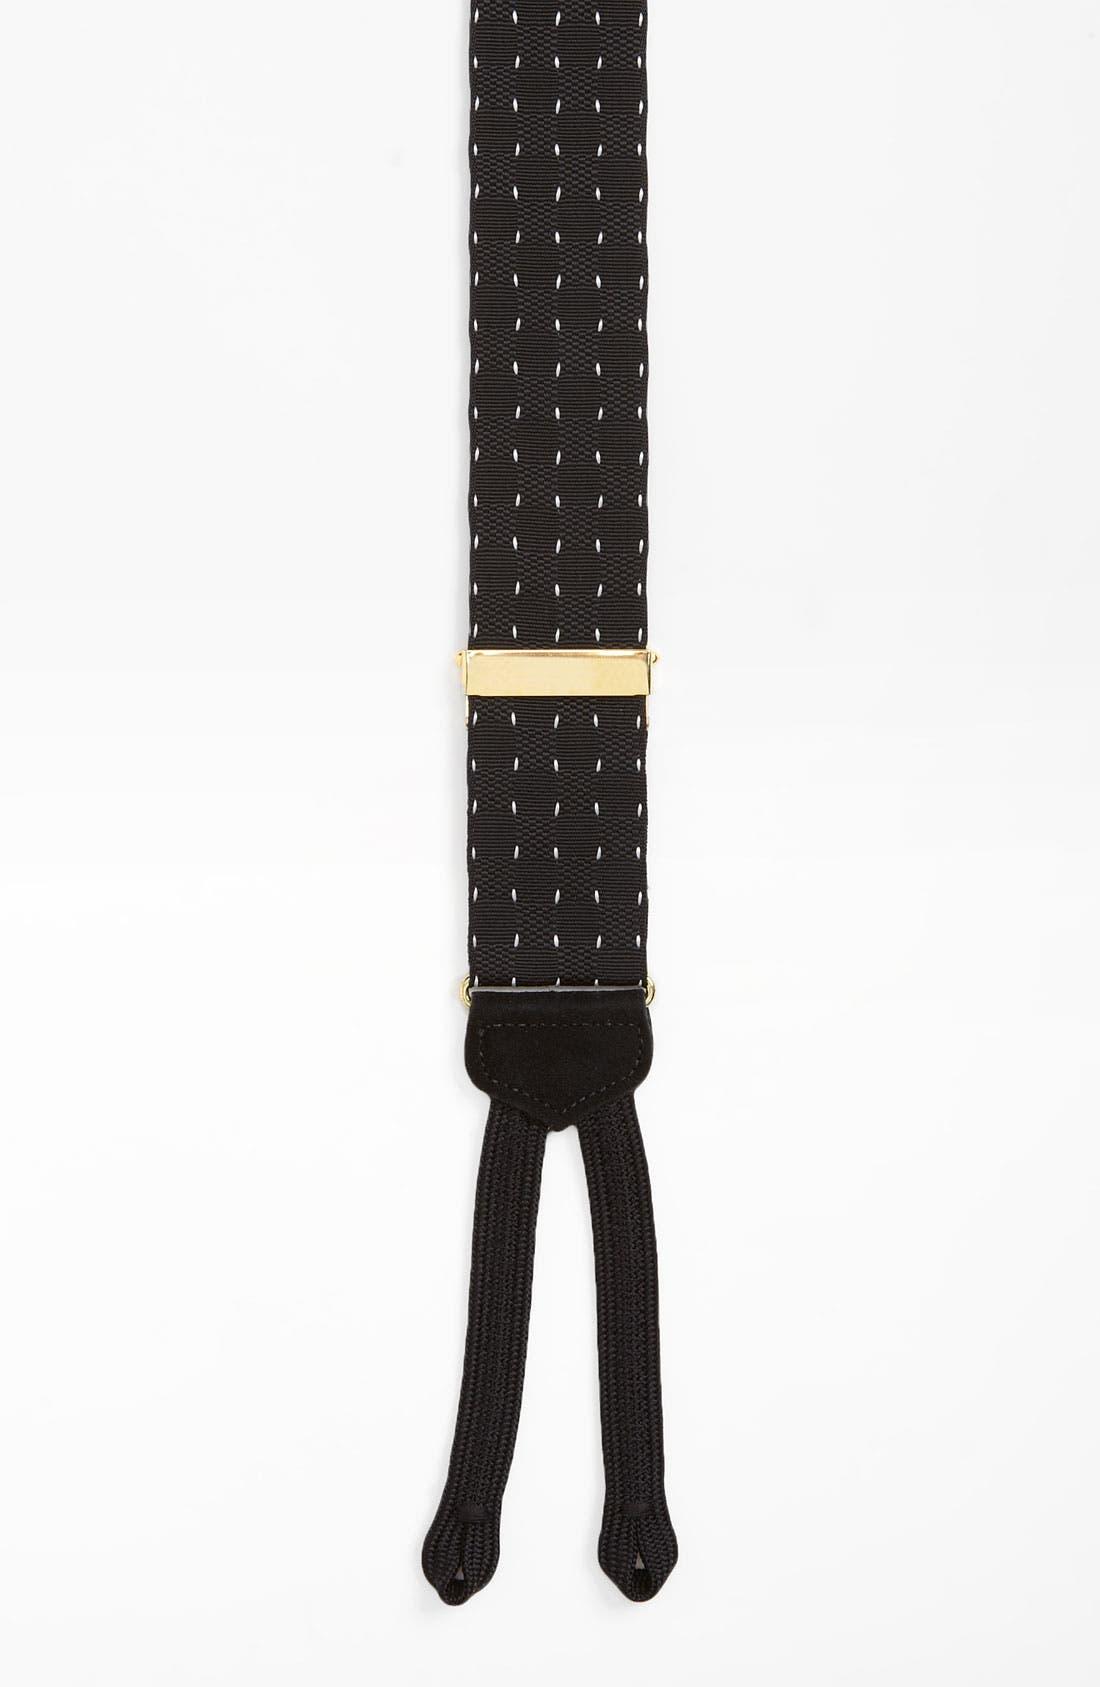 Main Image - Trafalgar Formal Pin Dot Suspenders